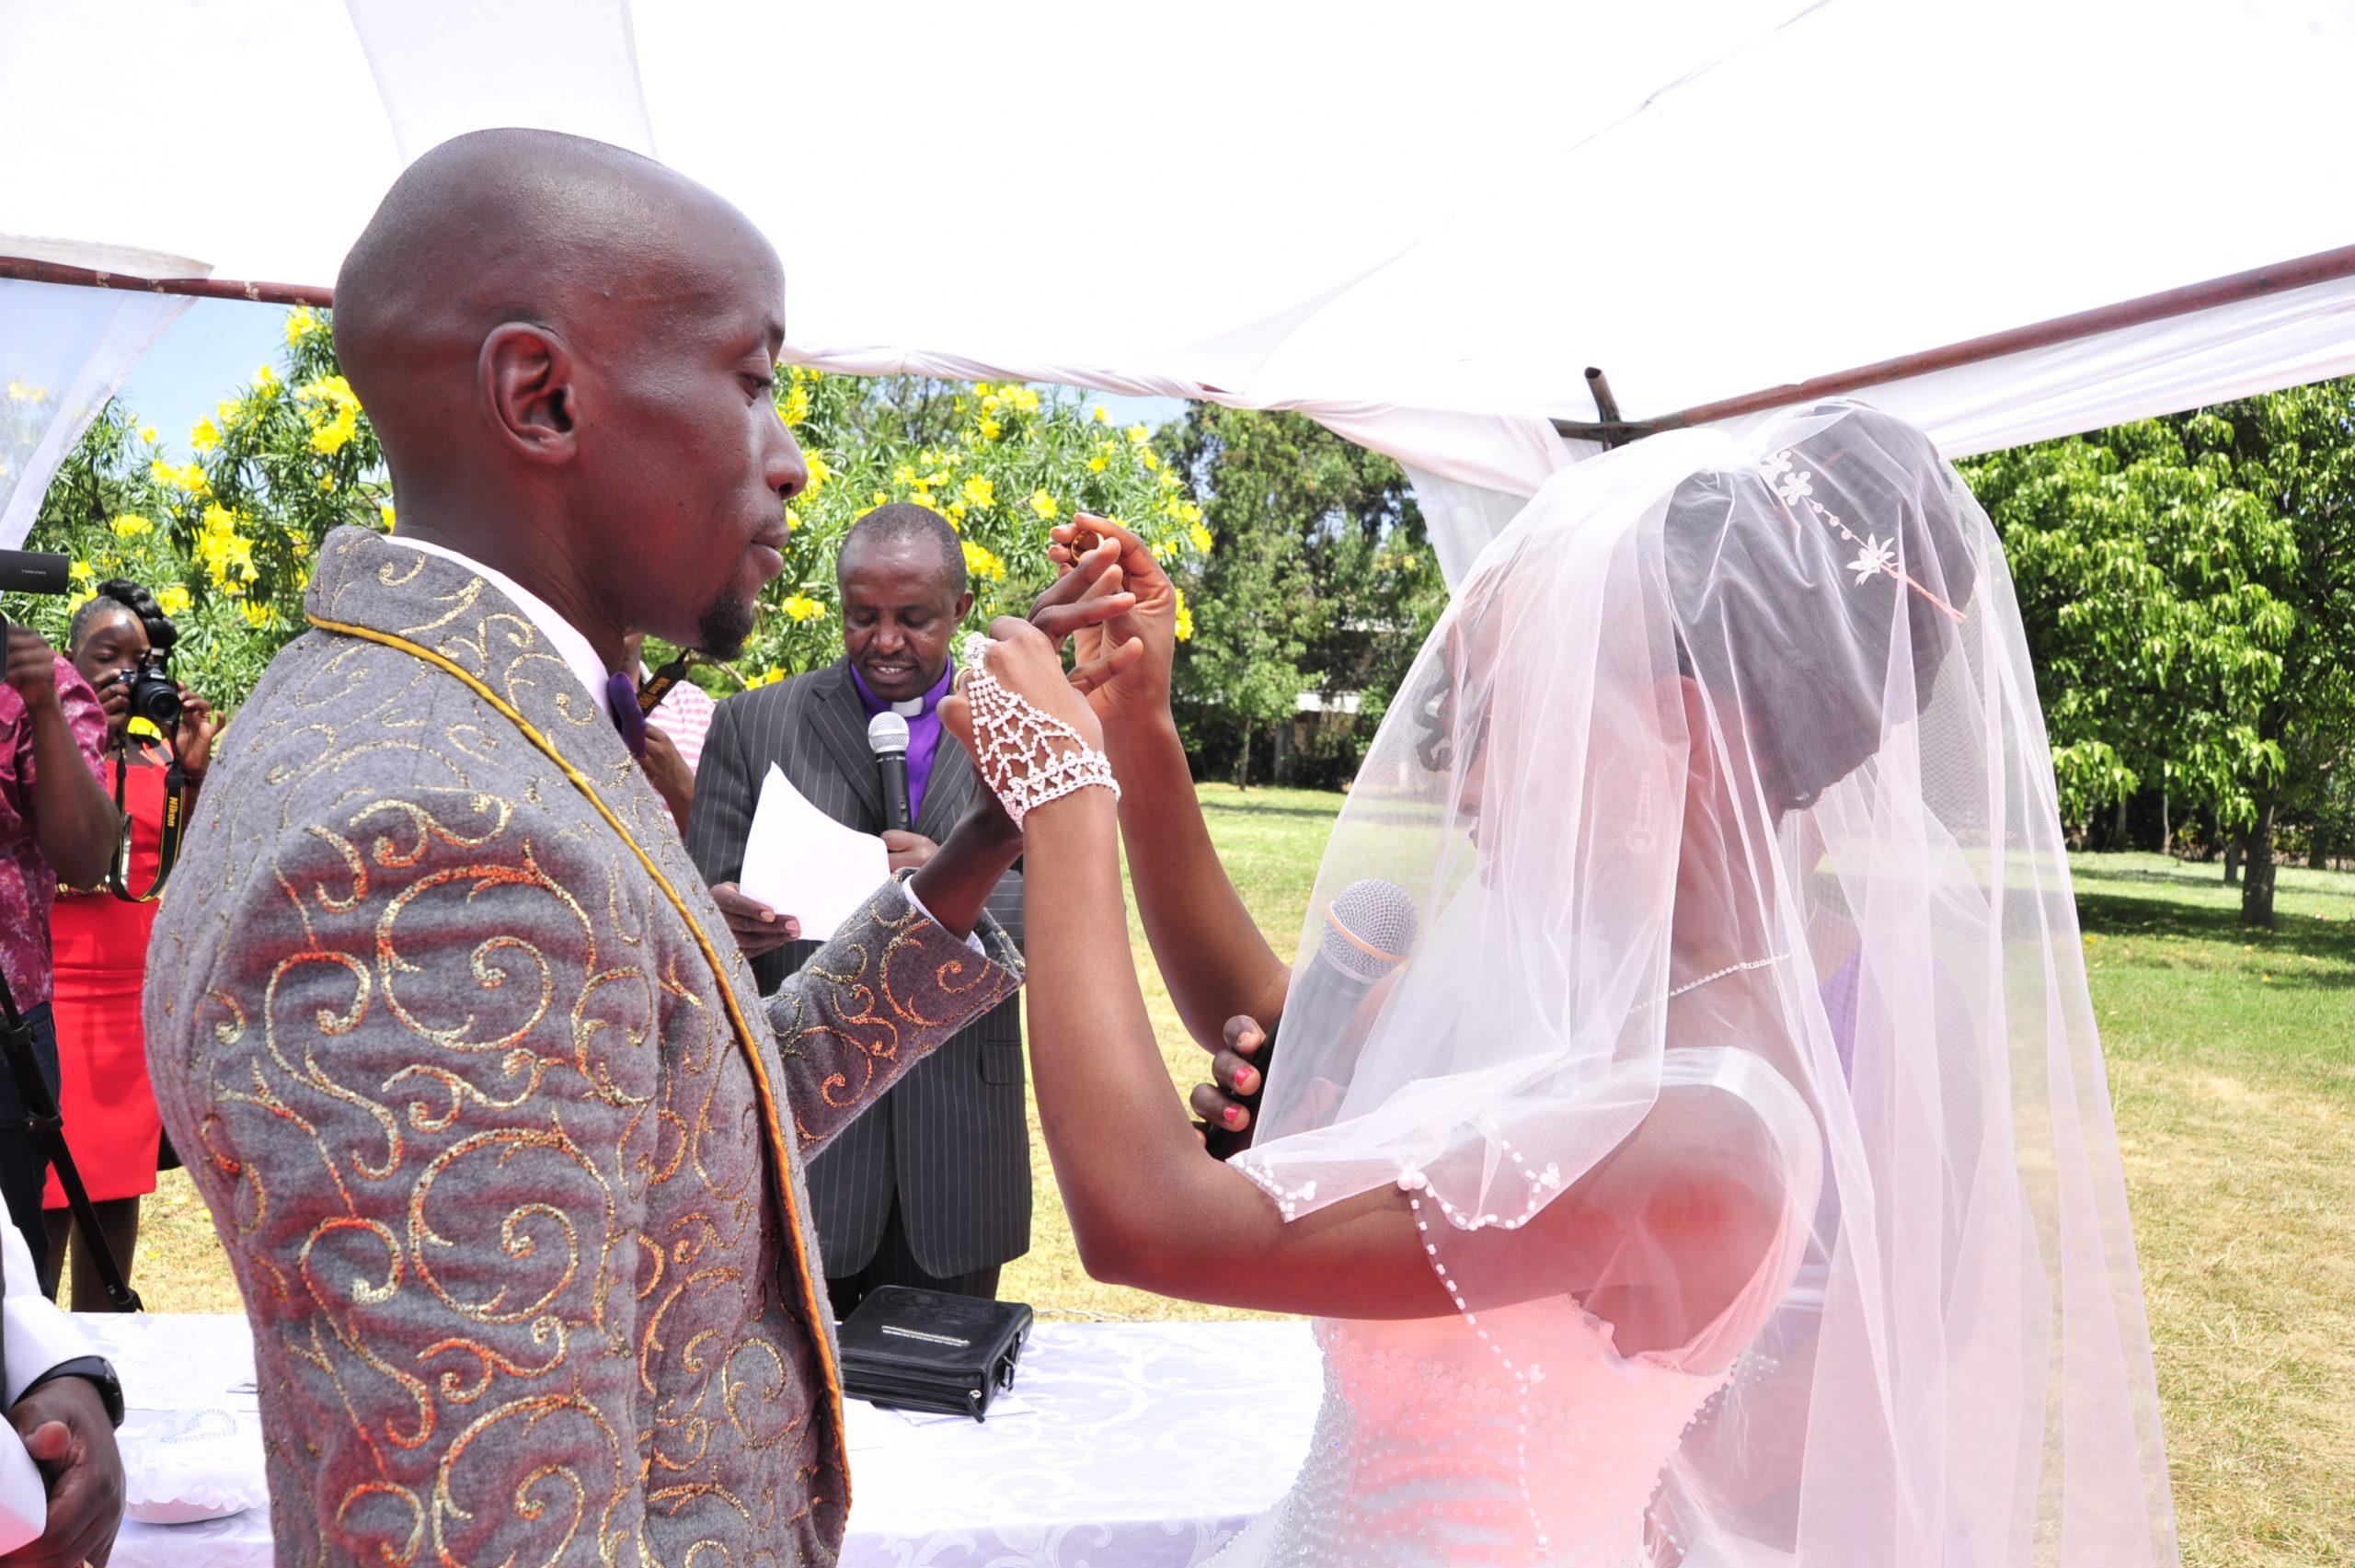 Awesome designer wedding blazers for the groom in Nairobi Kenya